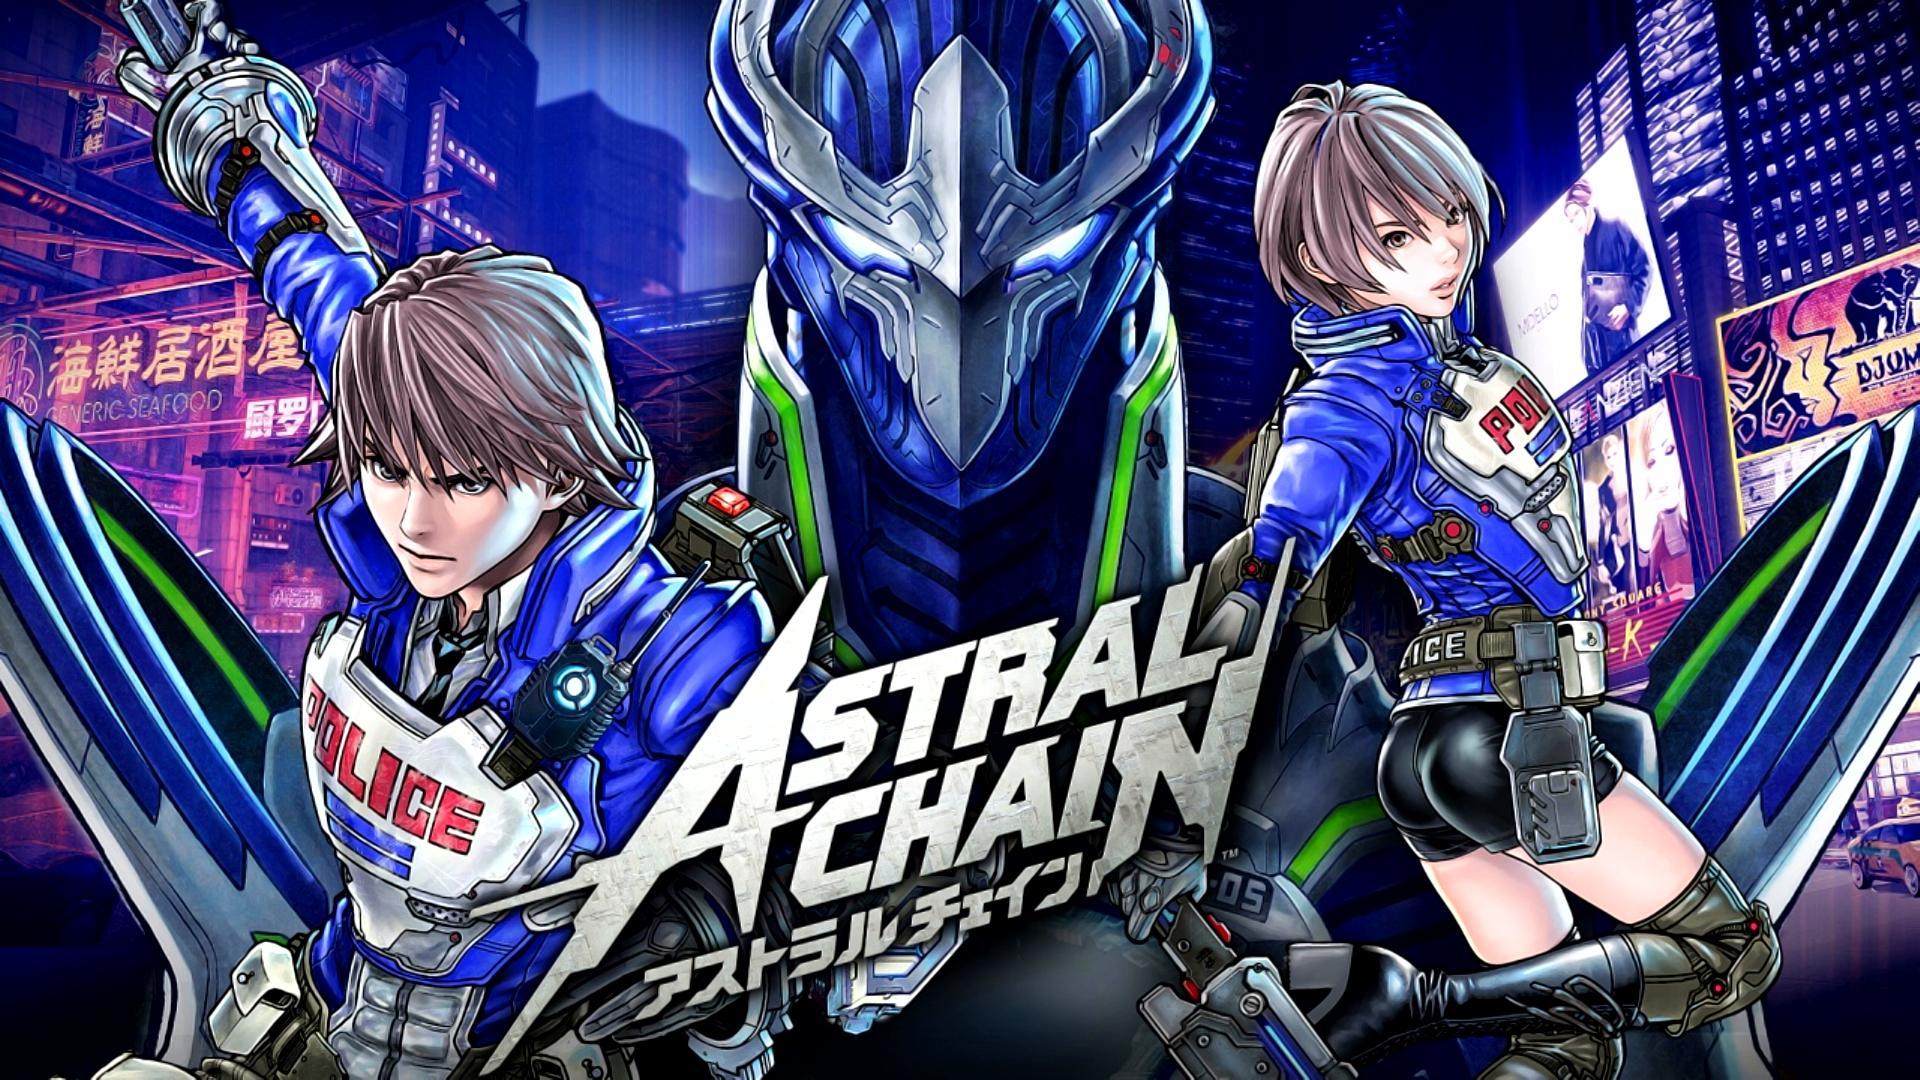 Astral-Chain_2019_05-15-19_Artwork.jpg